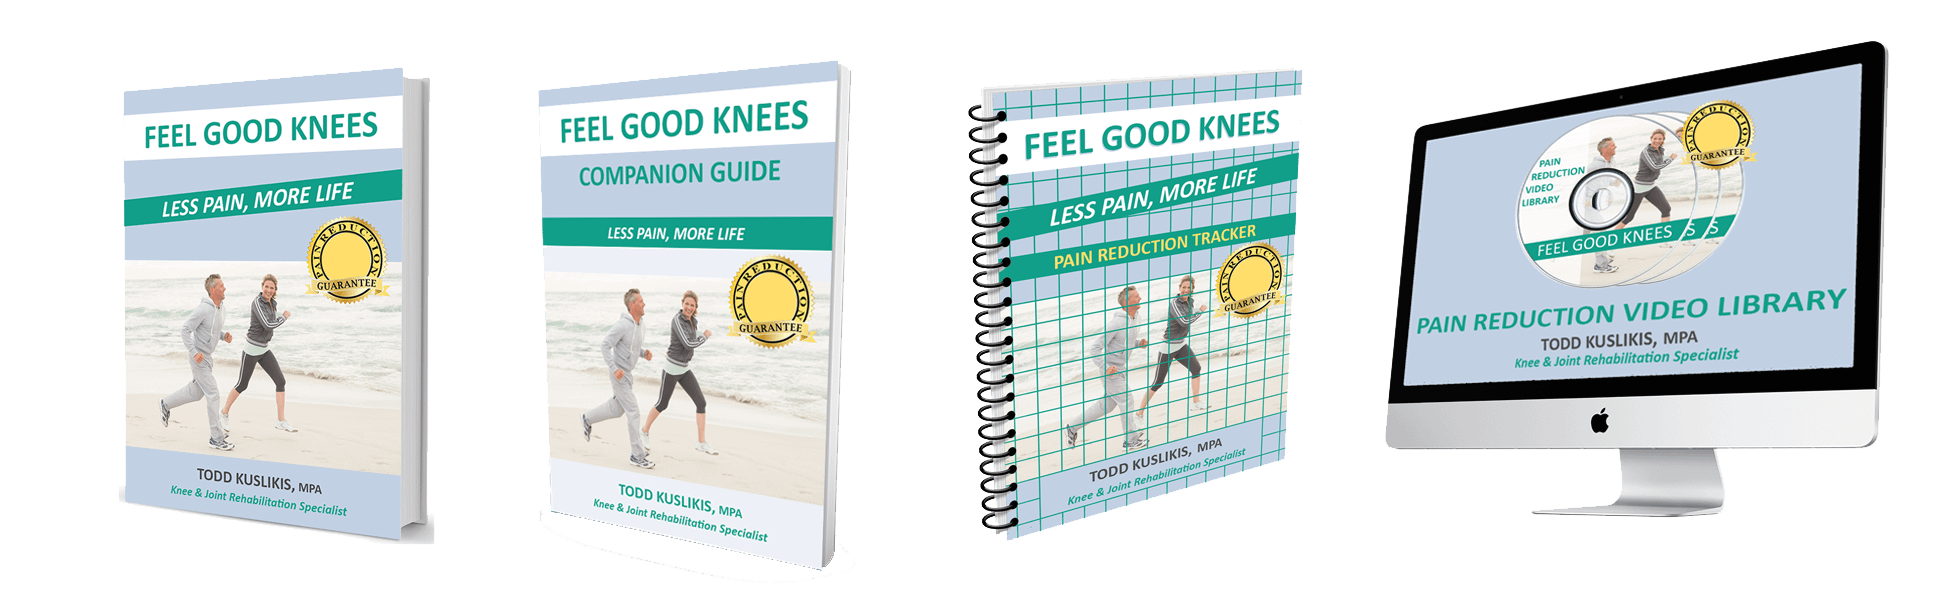 Read Full Feel Good Knees Review Here